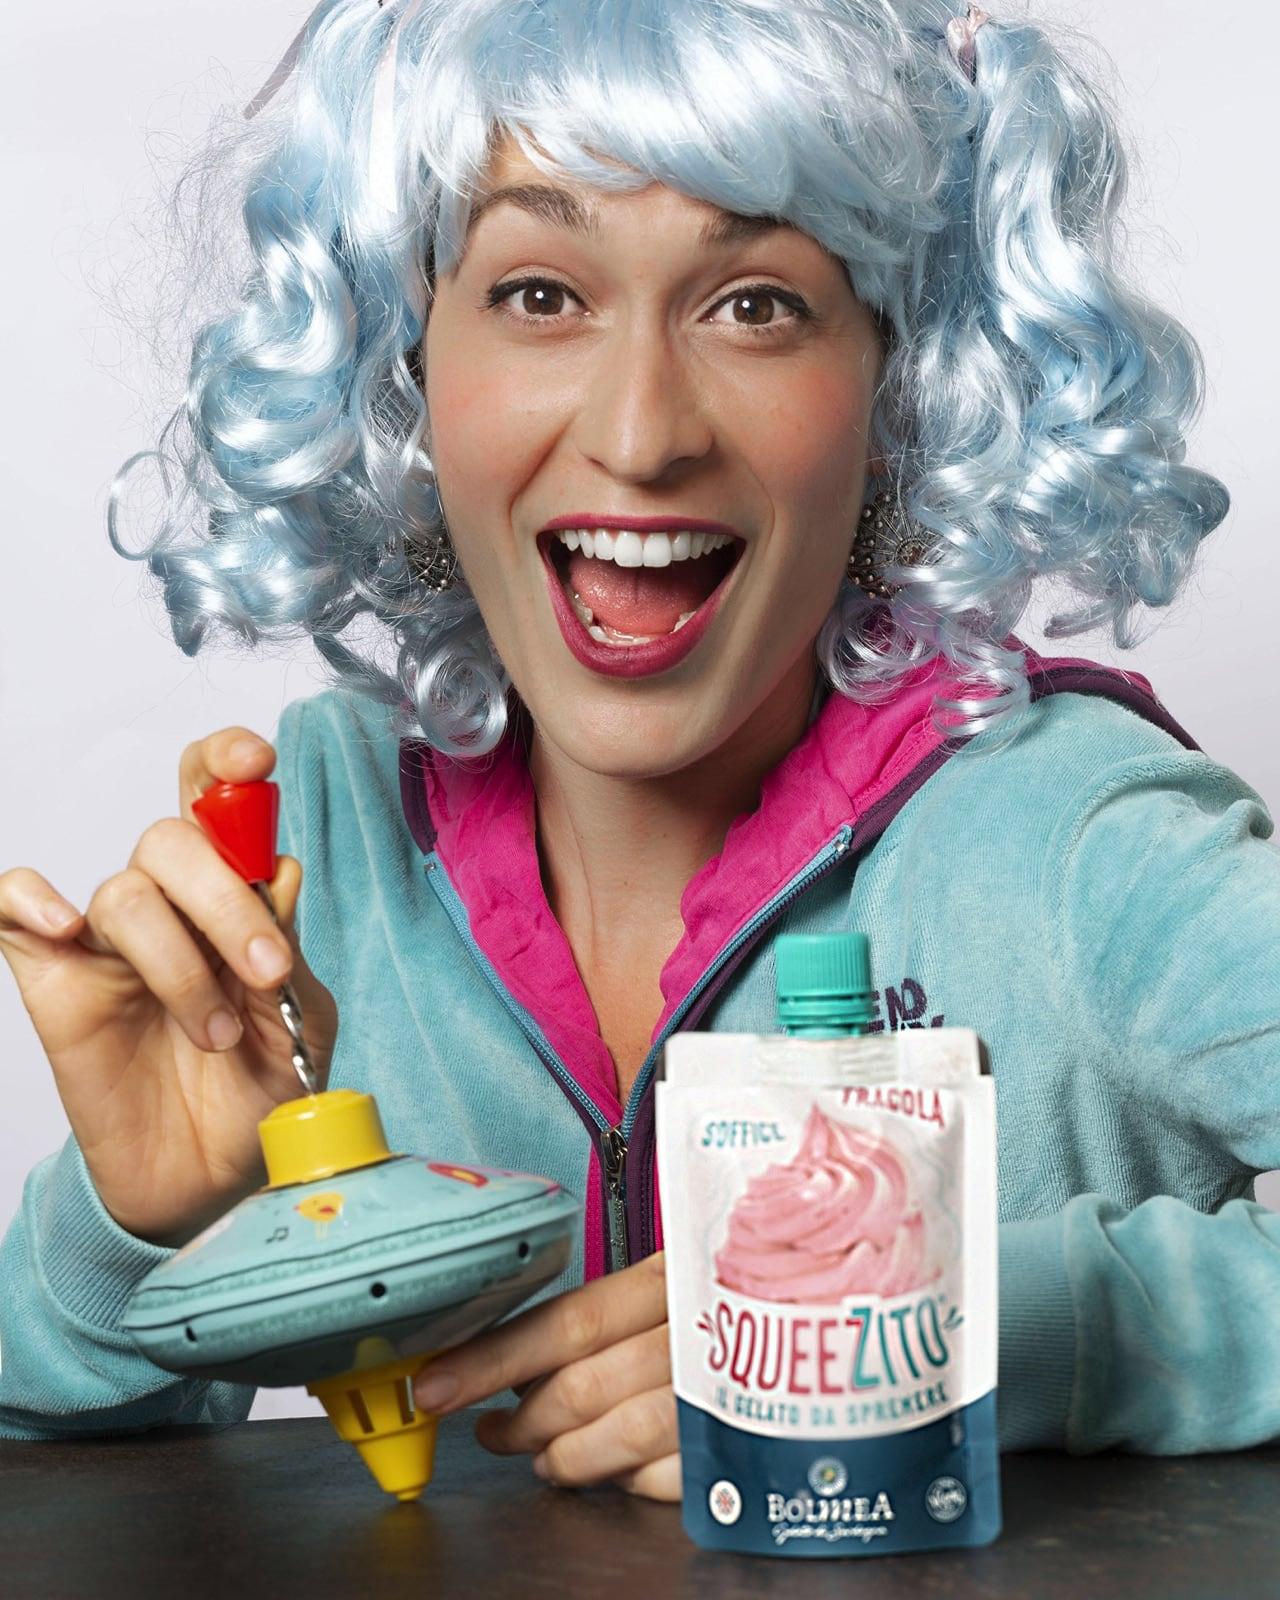 una ragazza con una parrucca turchina gioca con una trottola